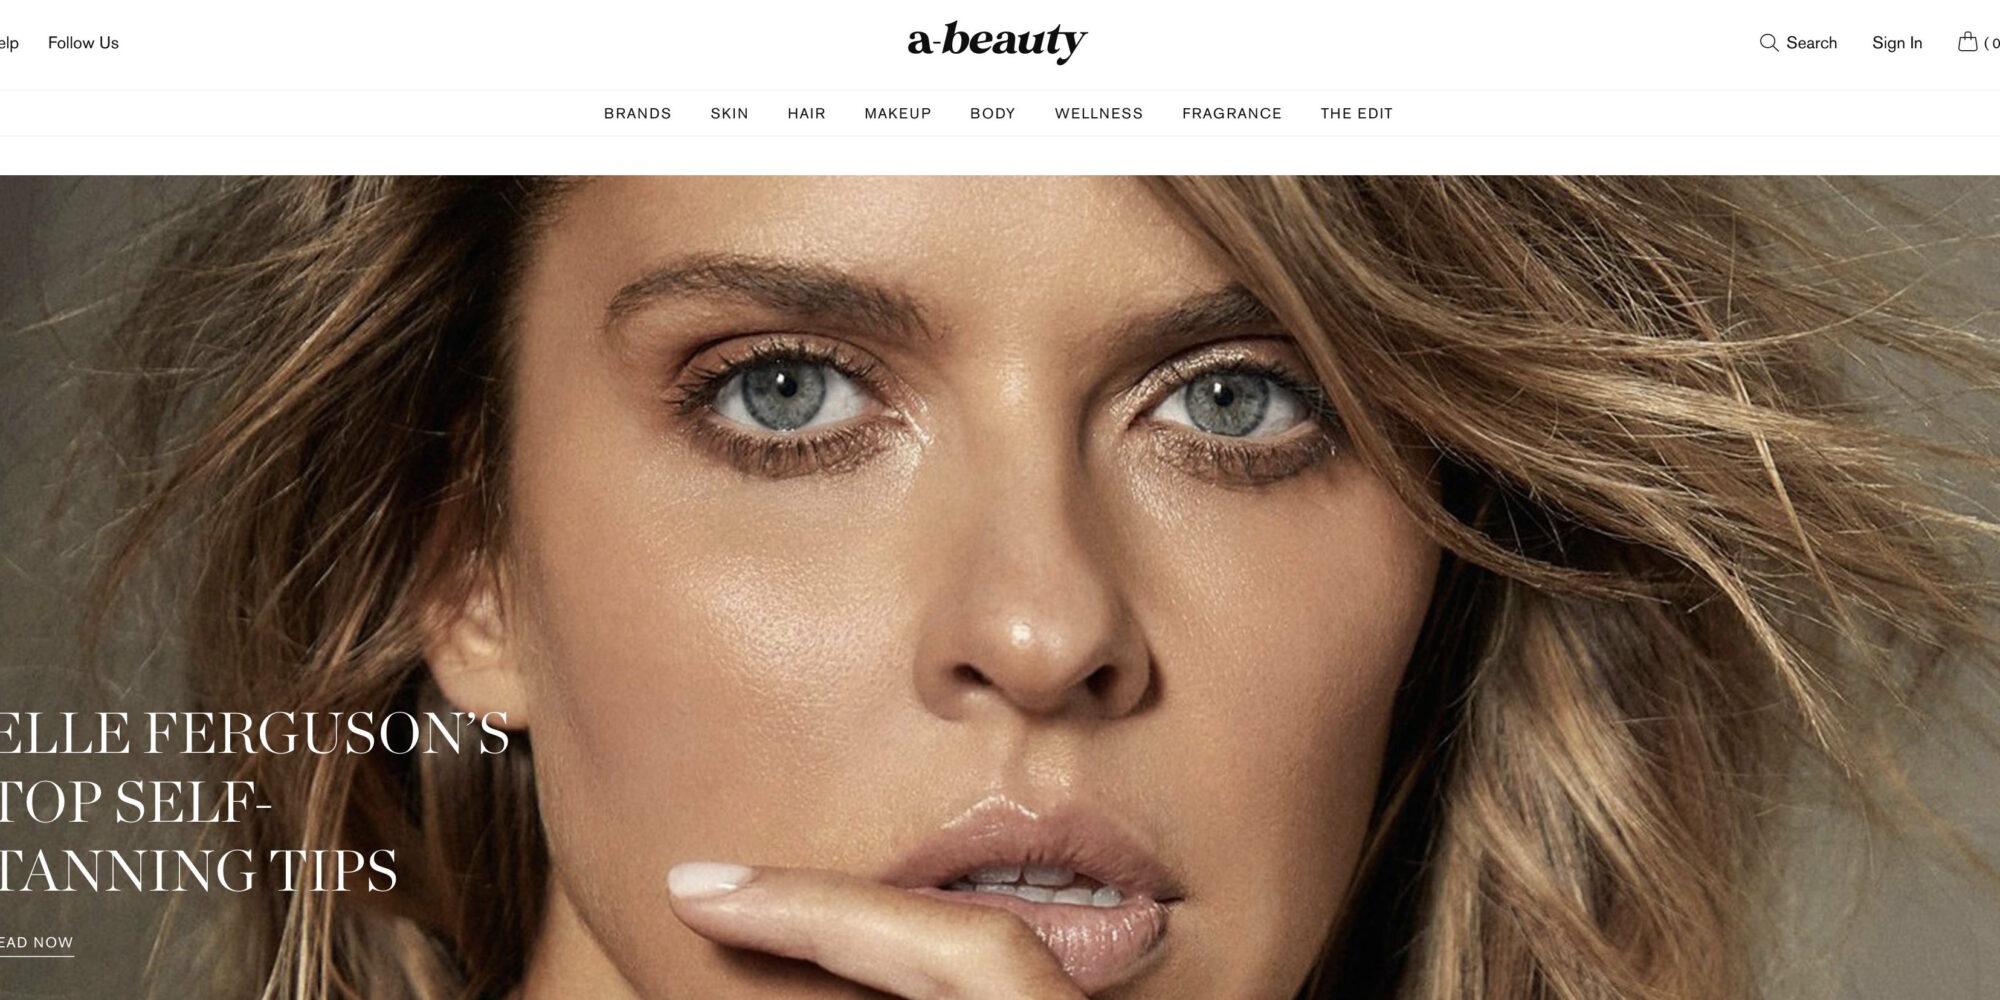 Alpha-H Founder Michelle Doherty's Daughter Jamee Parker Creates Australian Beauty E-Commerce Platform